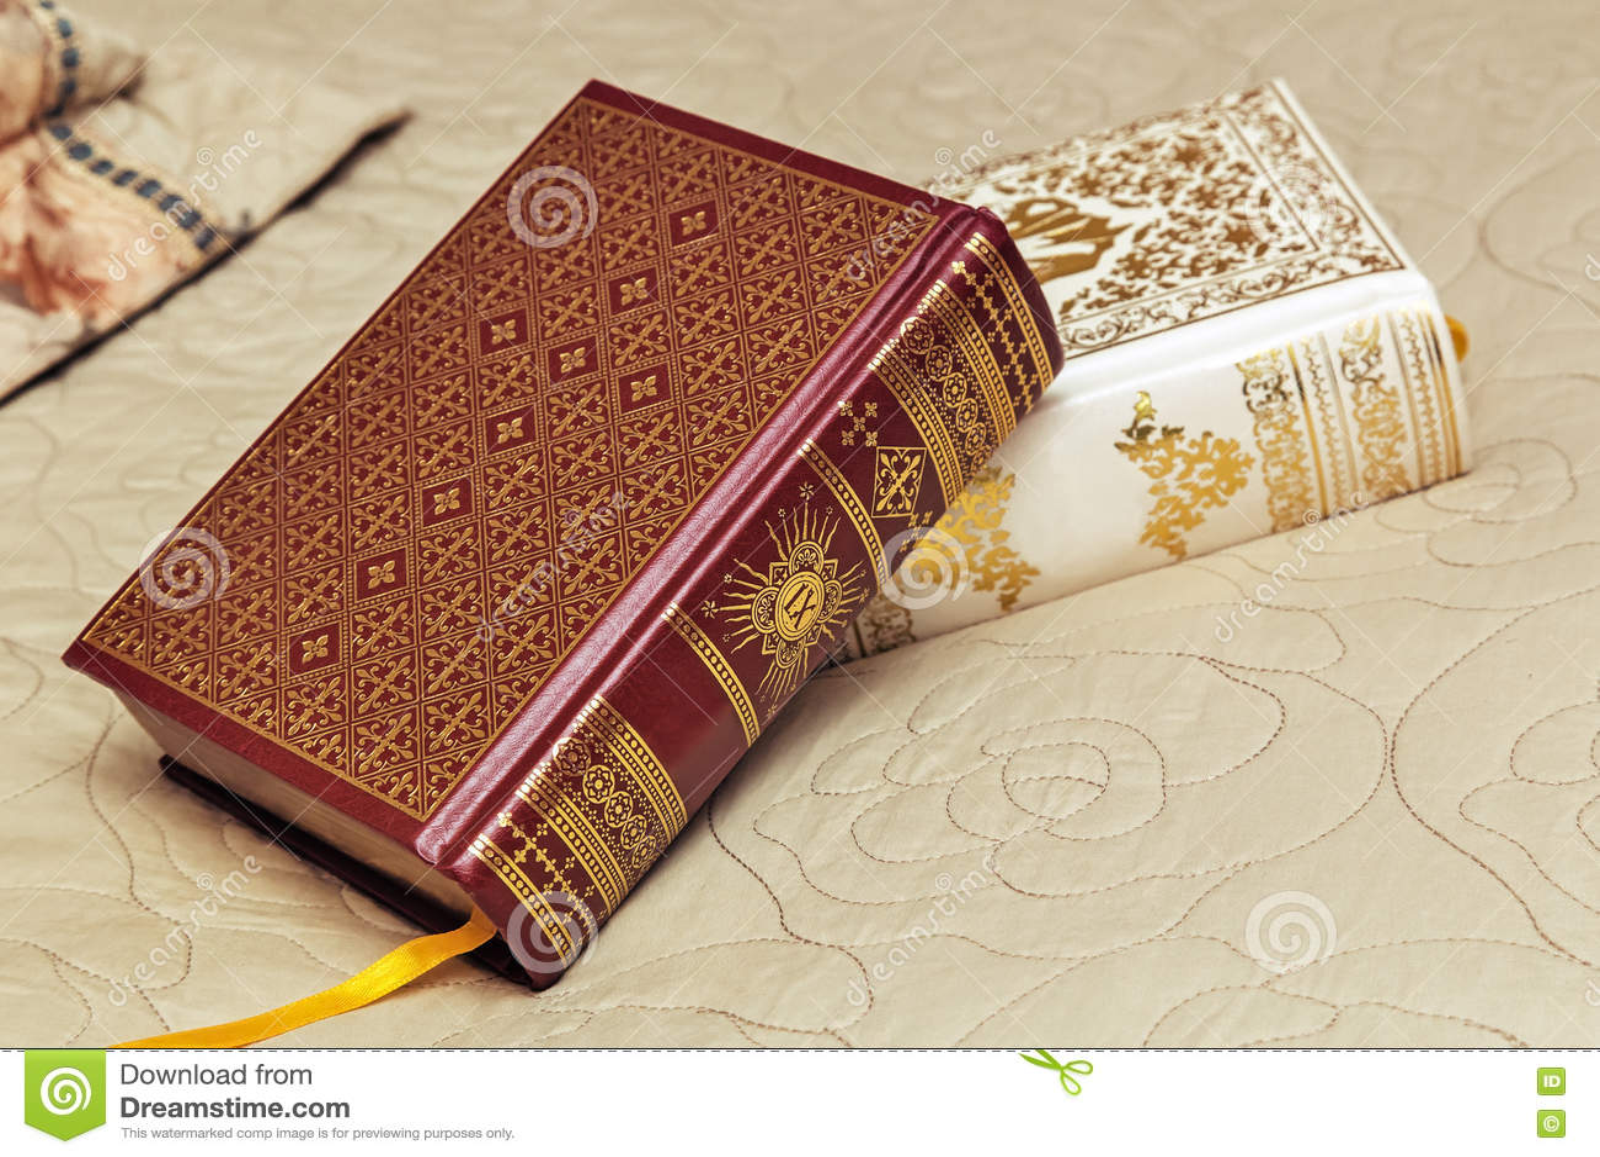 Due Libri In Belle Rilegature Immagine Stock Immagine Di Storia